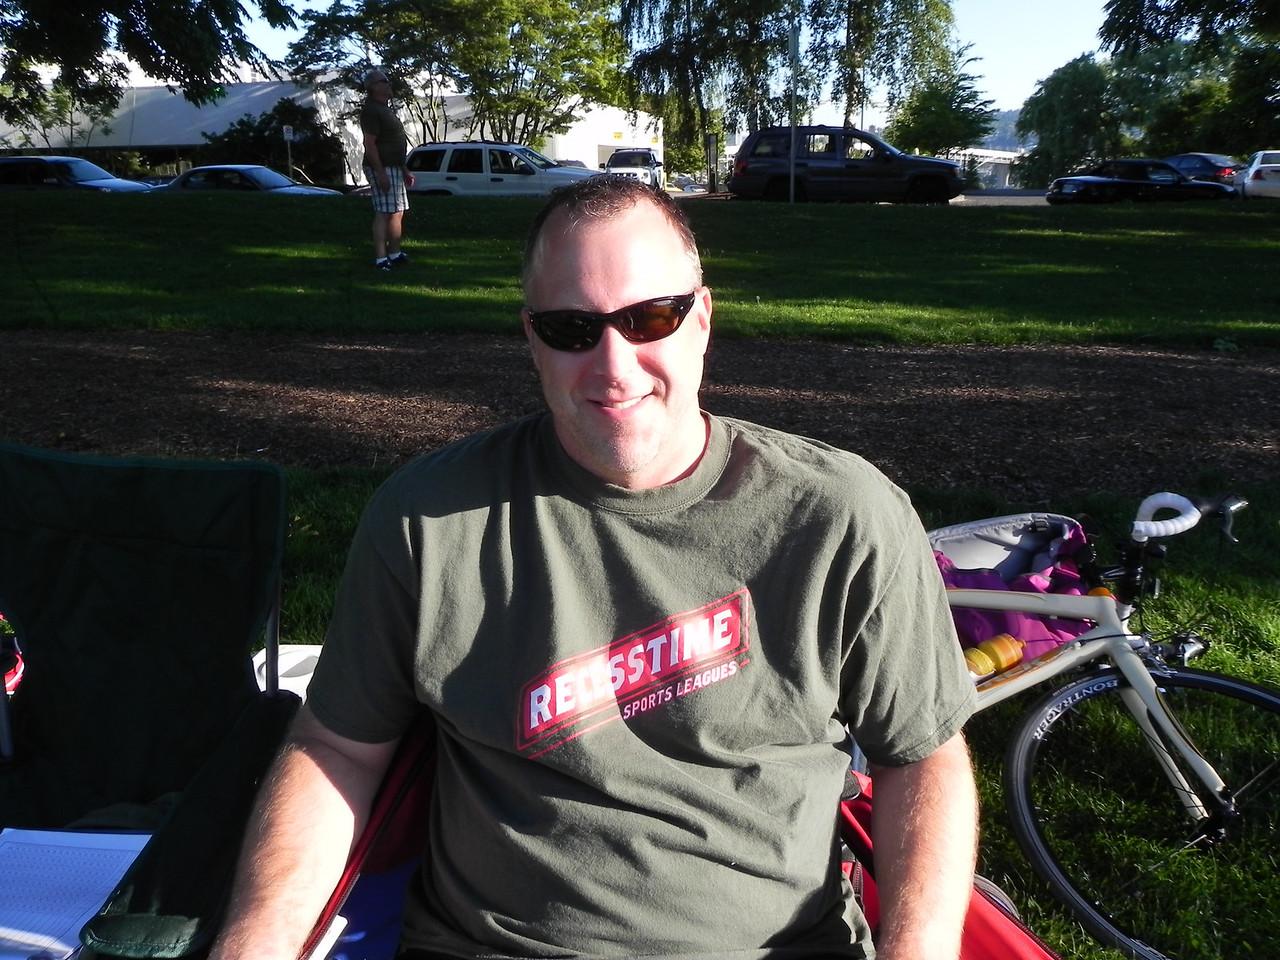 Best Ref - Jason Balzek Ater Wynners